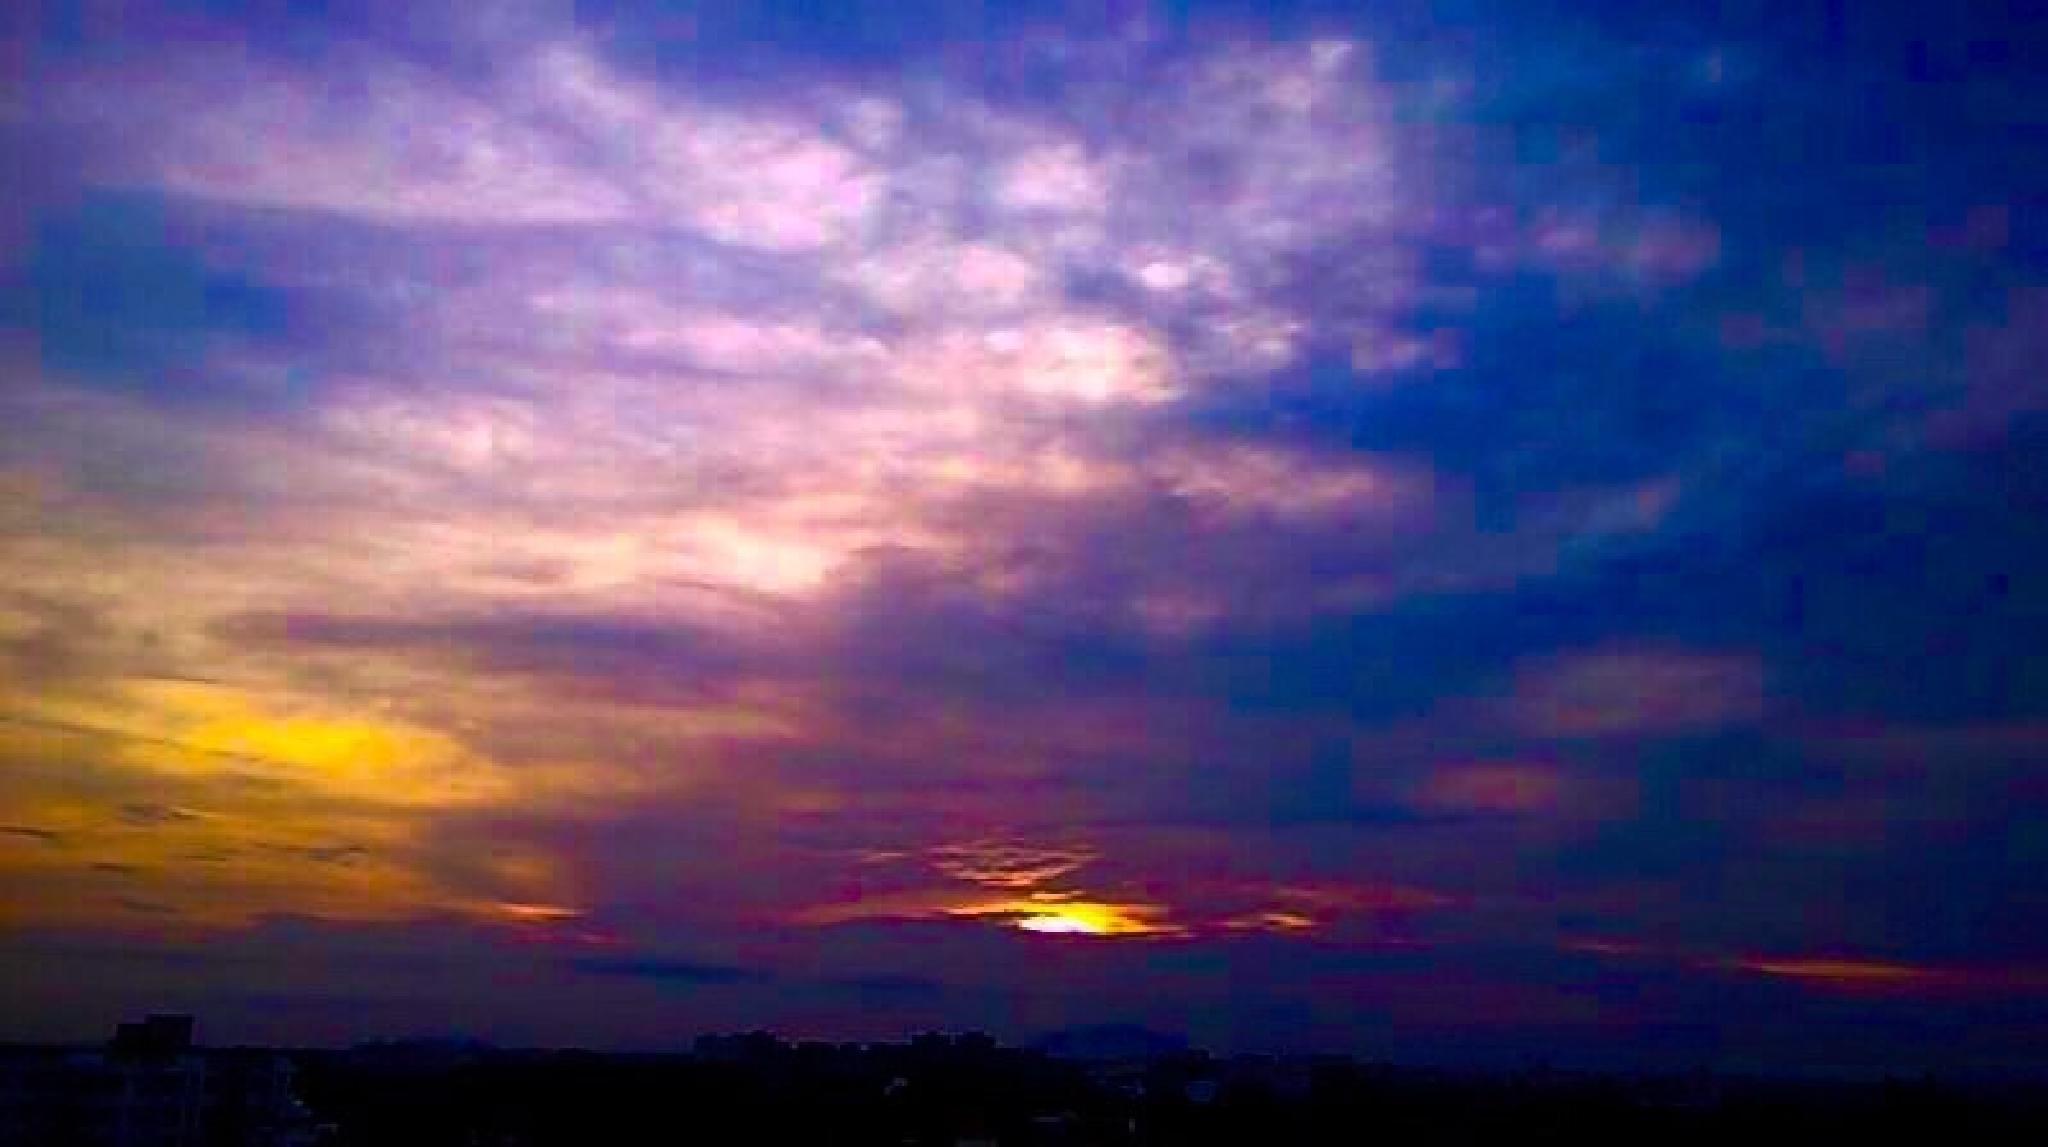 Sunrise over the city by Anjana Chakraborti